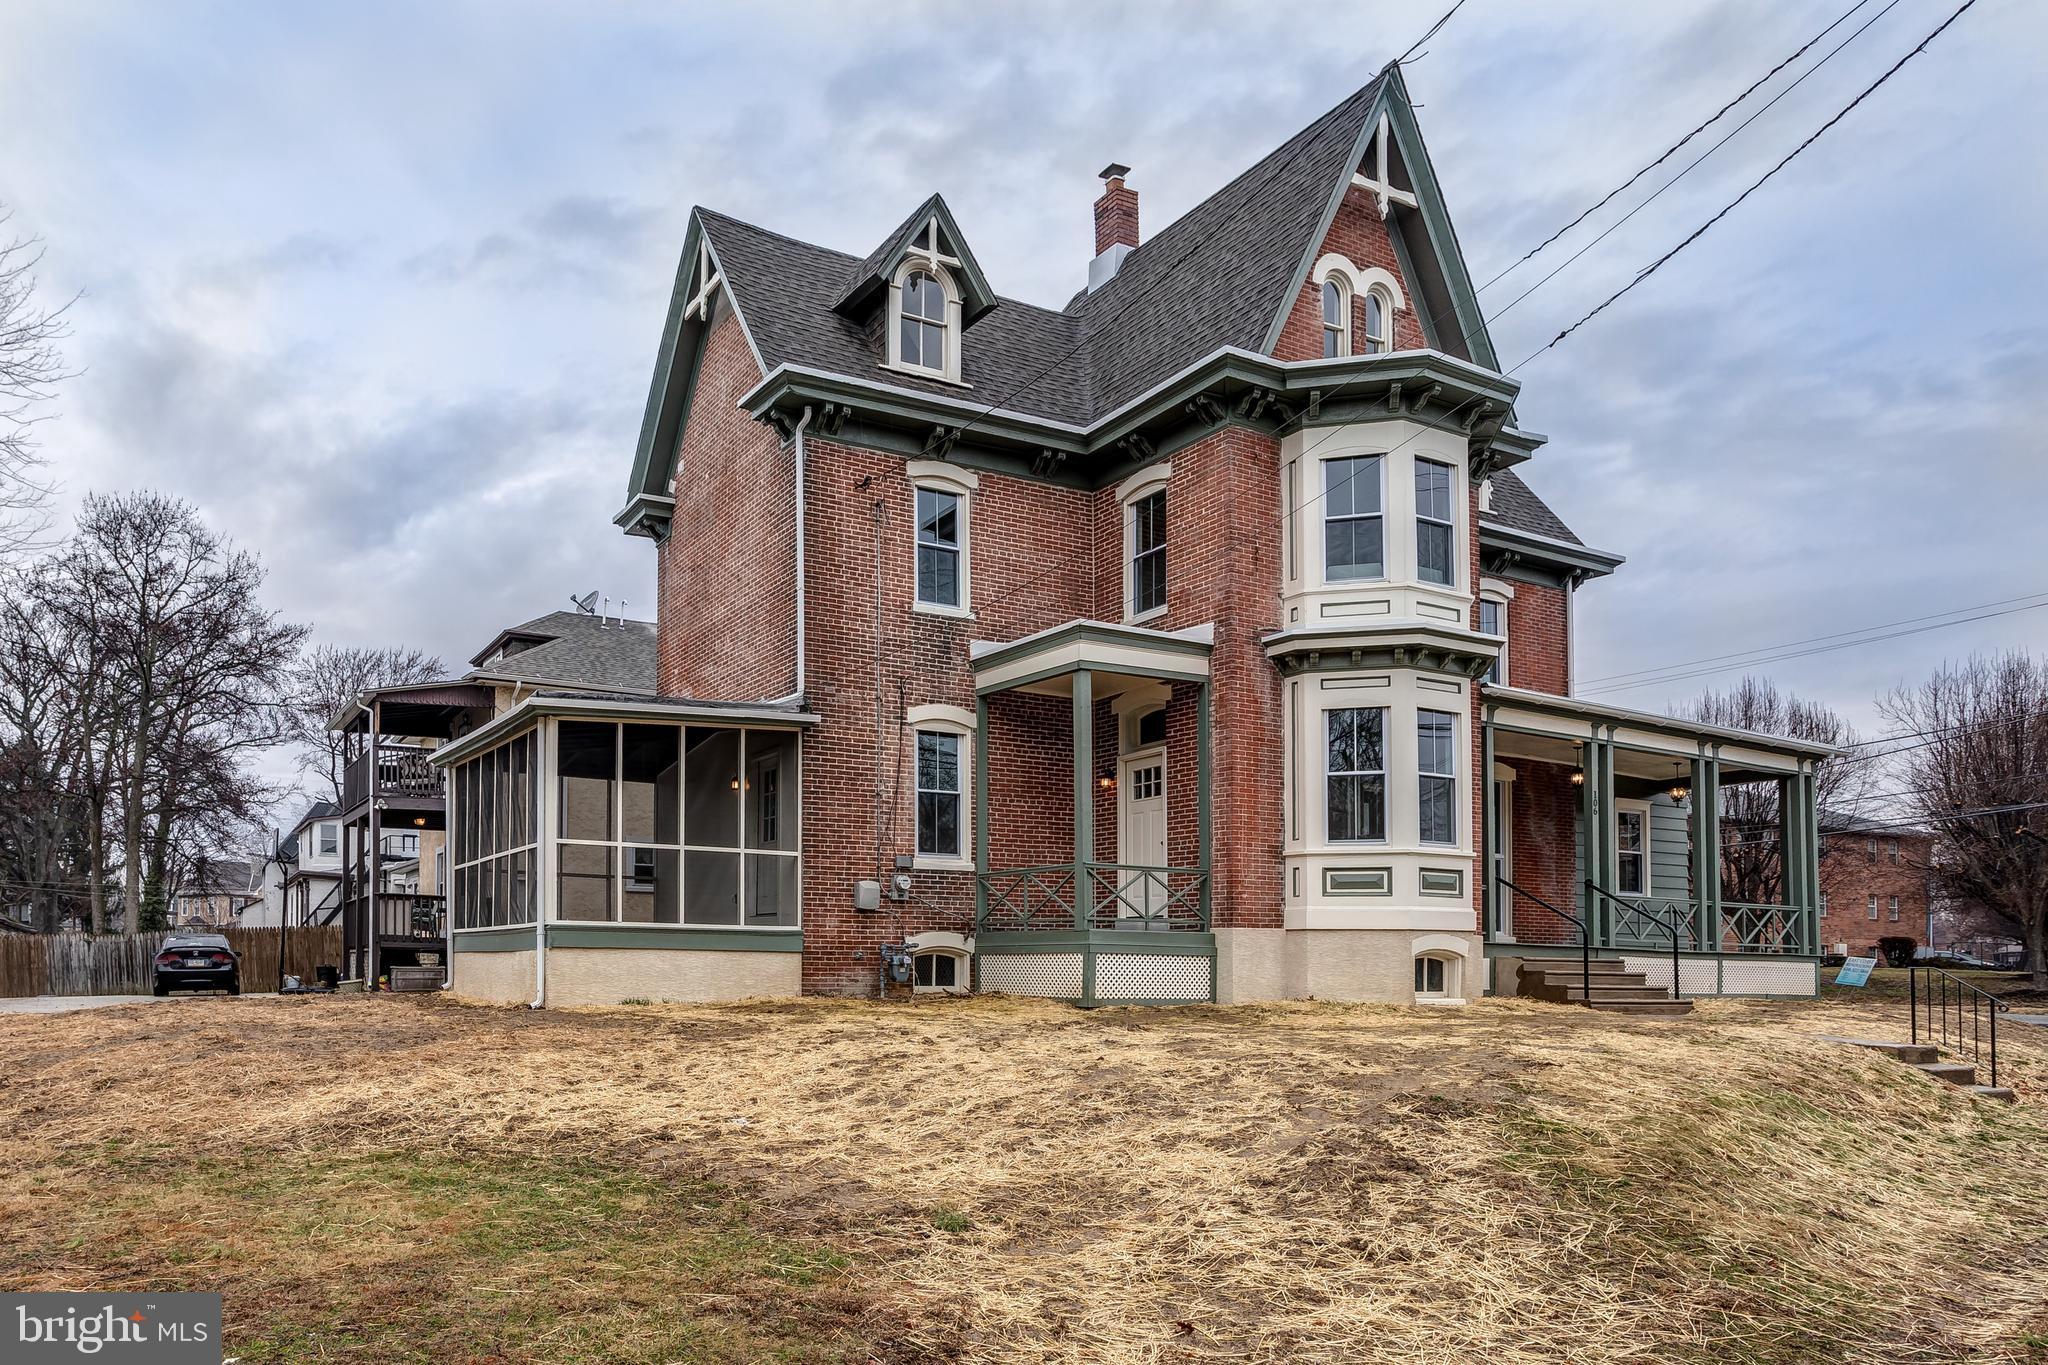 106 N SWARTHMORE AVENUE, RIDLEY PARK, PA 19078